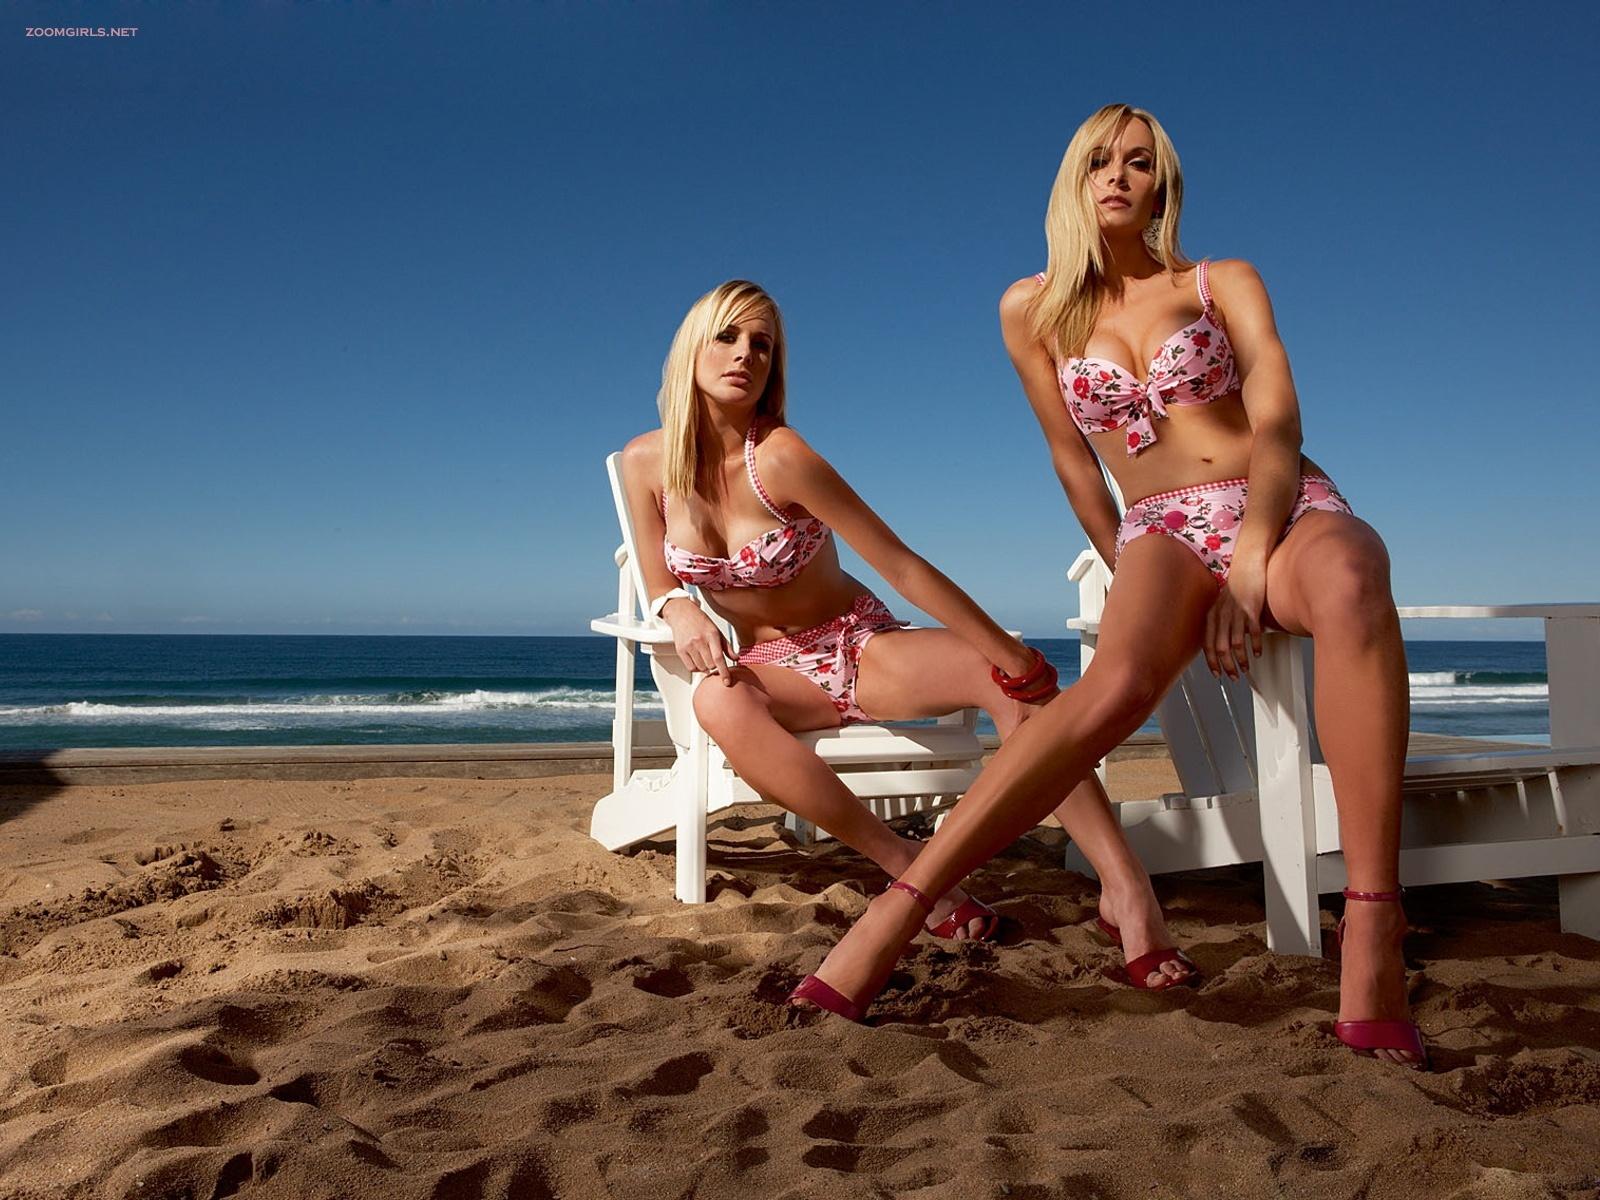 Hot twins in bikini words... super